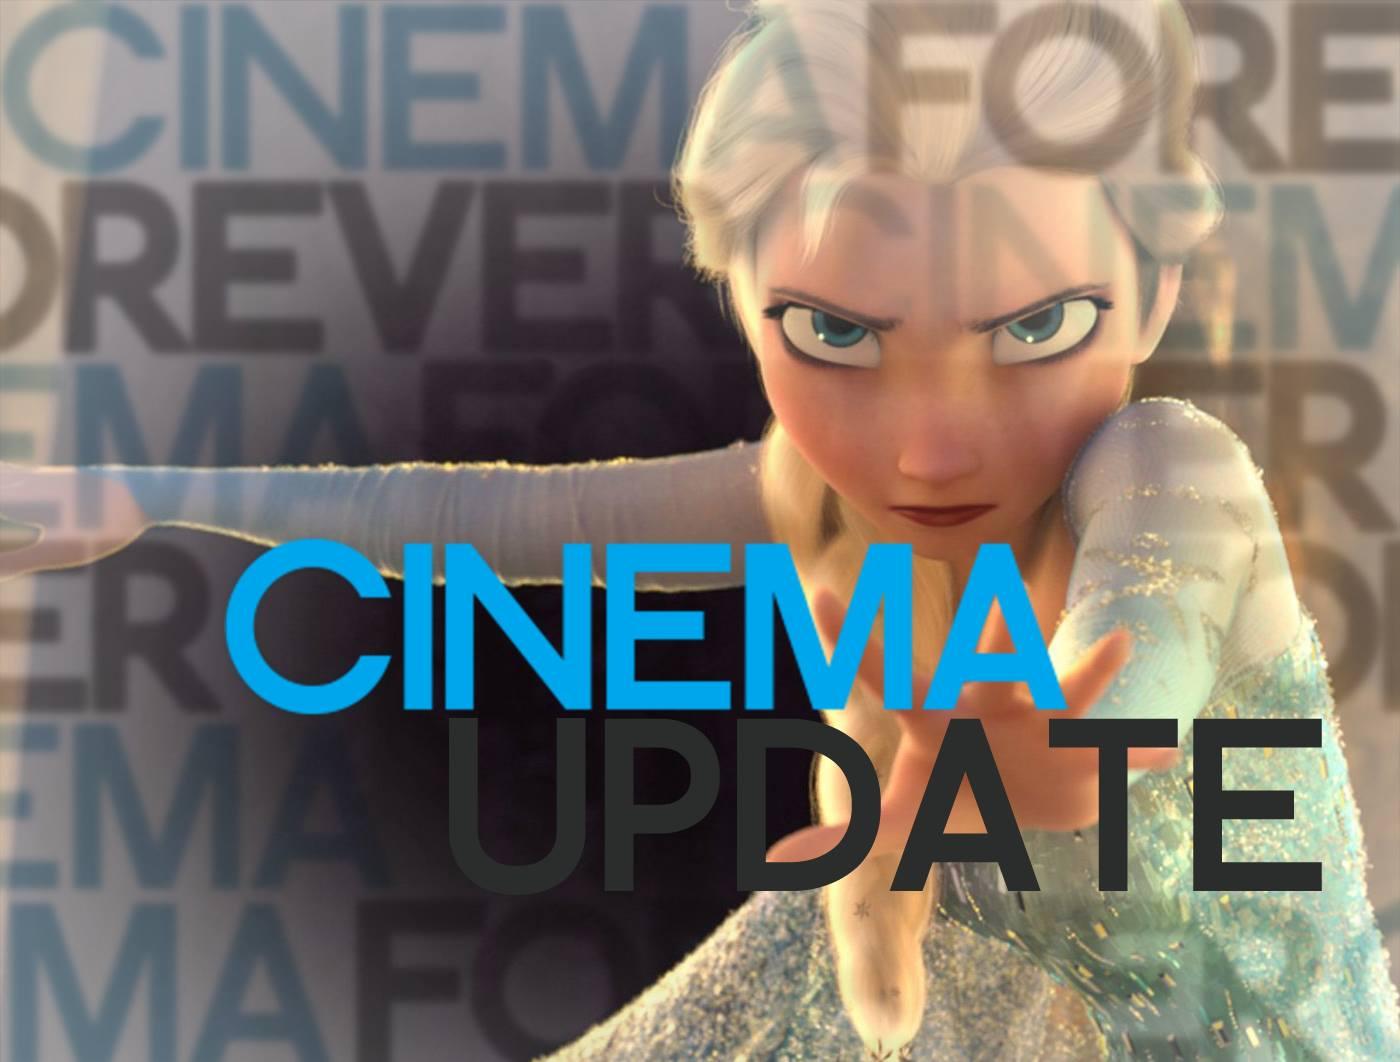 Podcast: Cinema Update #9 – Space Jam 2, Han Solo & #GiveElsaAGirlfriend